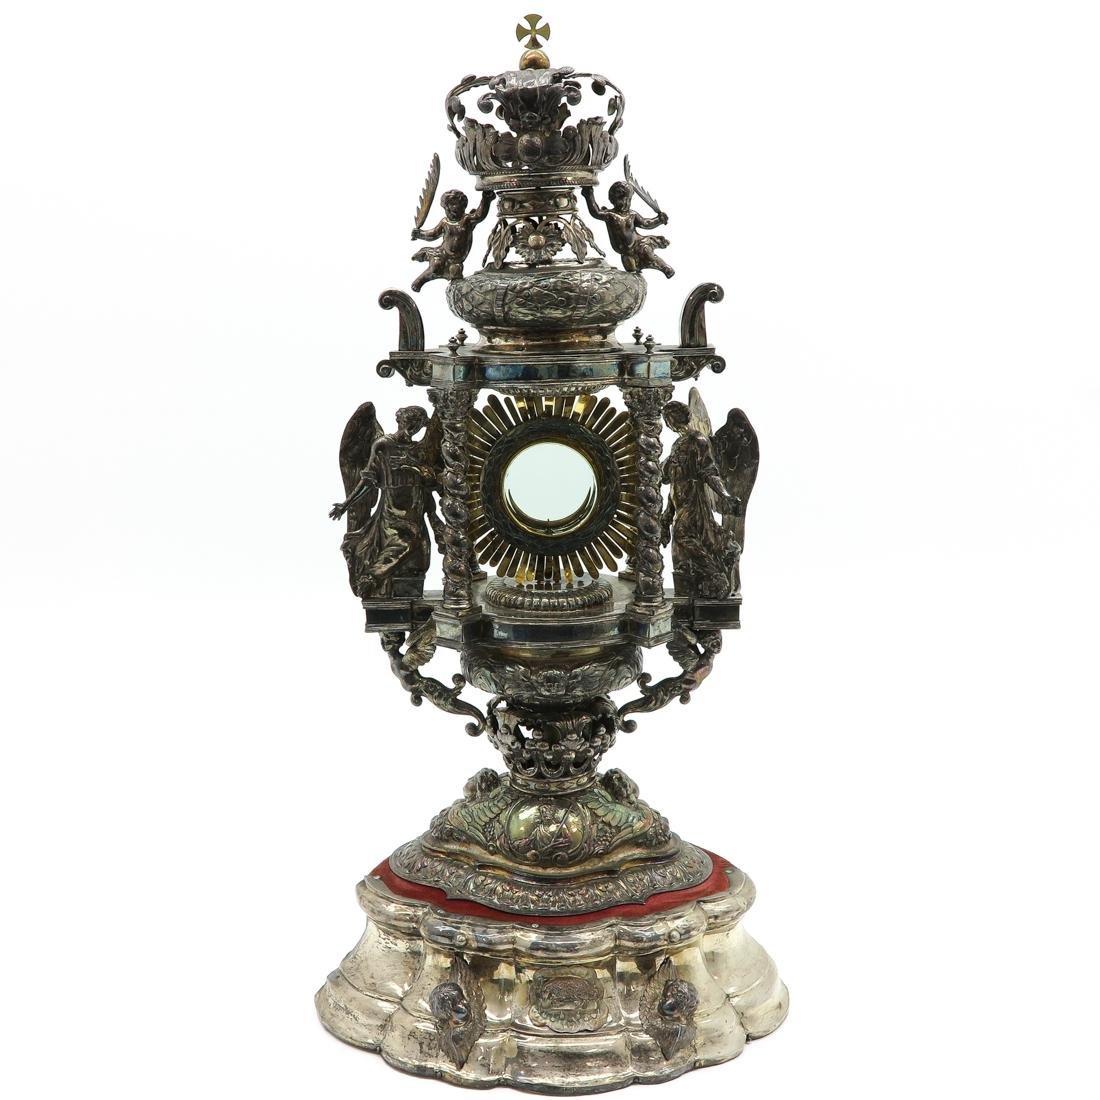 A Fine 18th / 19th Century Silver Monstrance